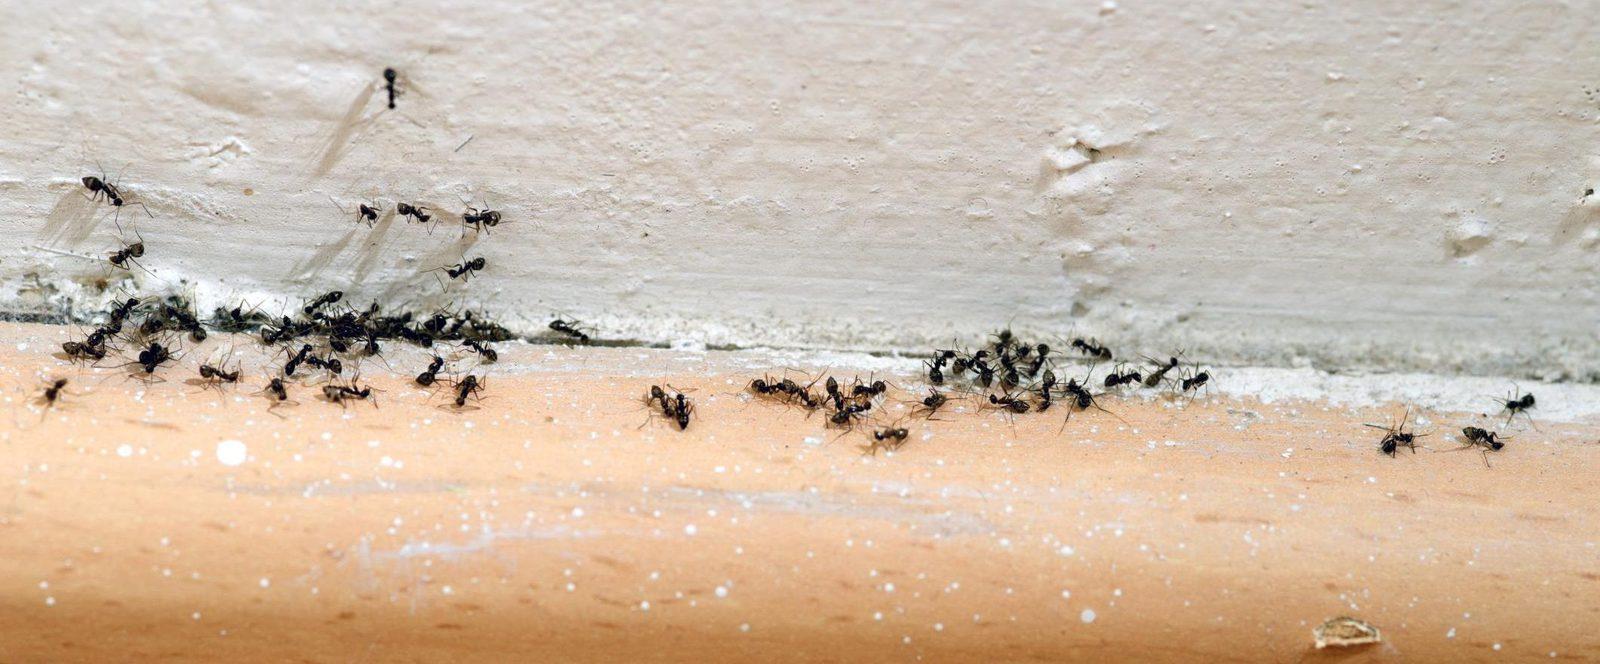 ant extermination Ipswich